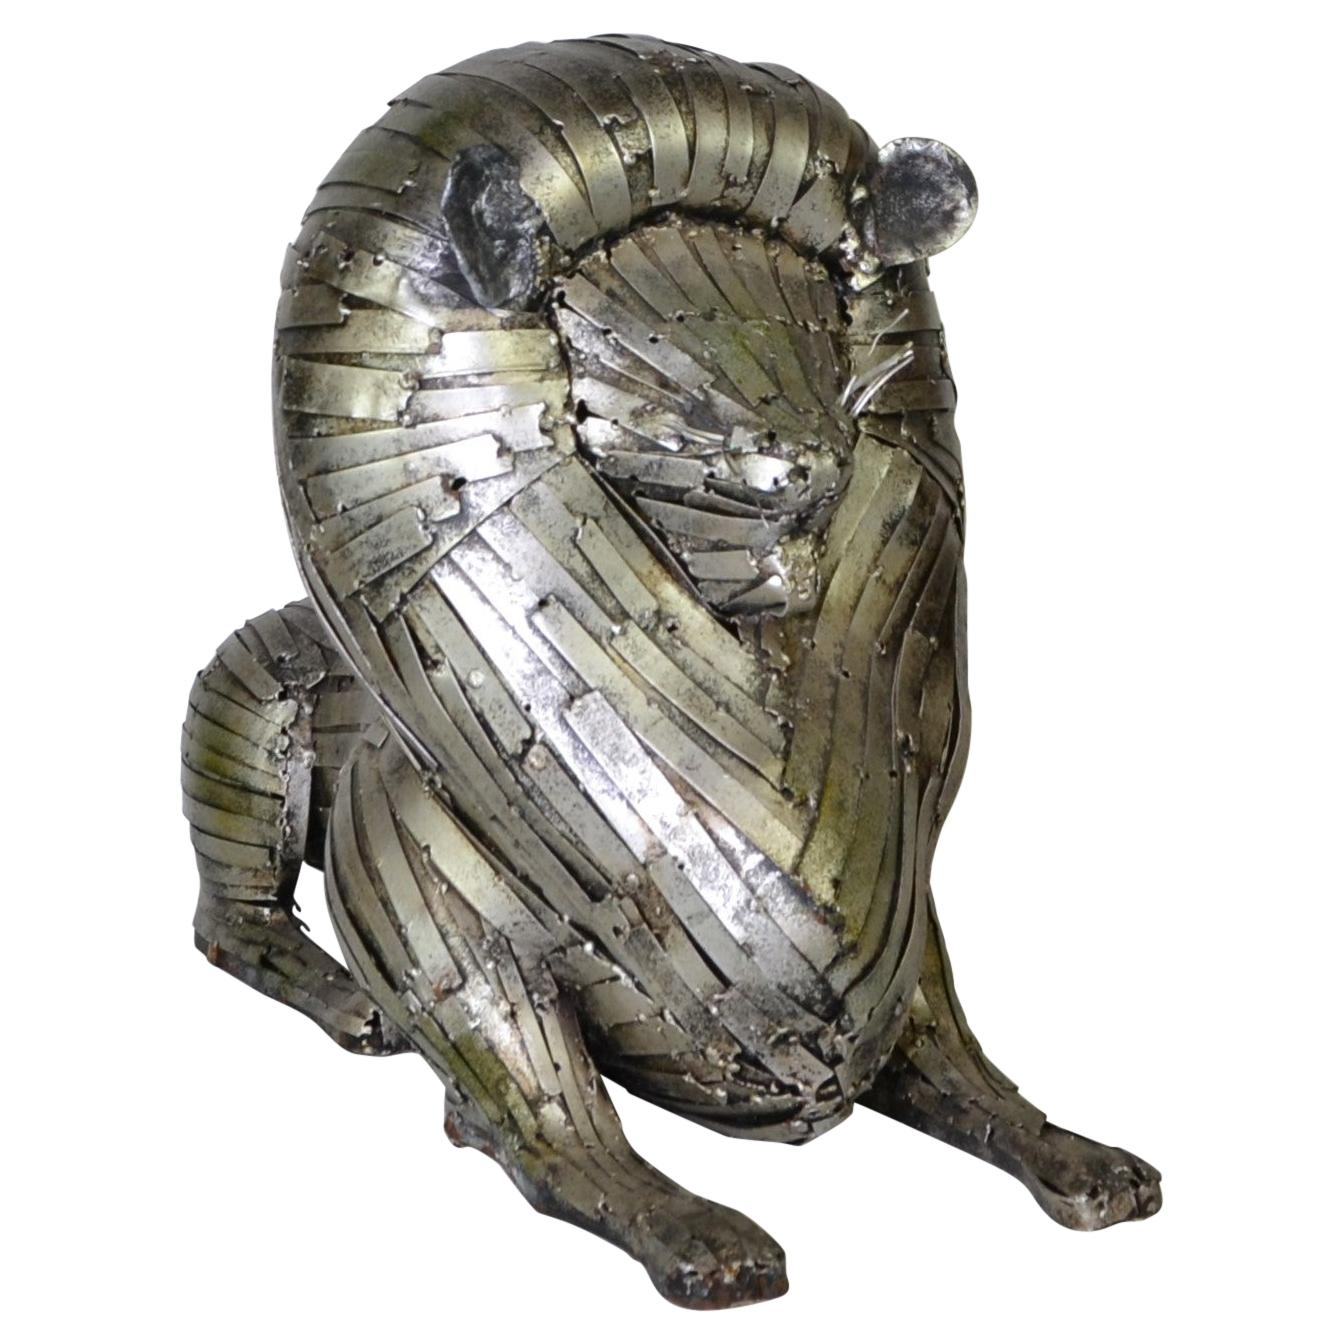 Metal Lion Sculpture